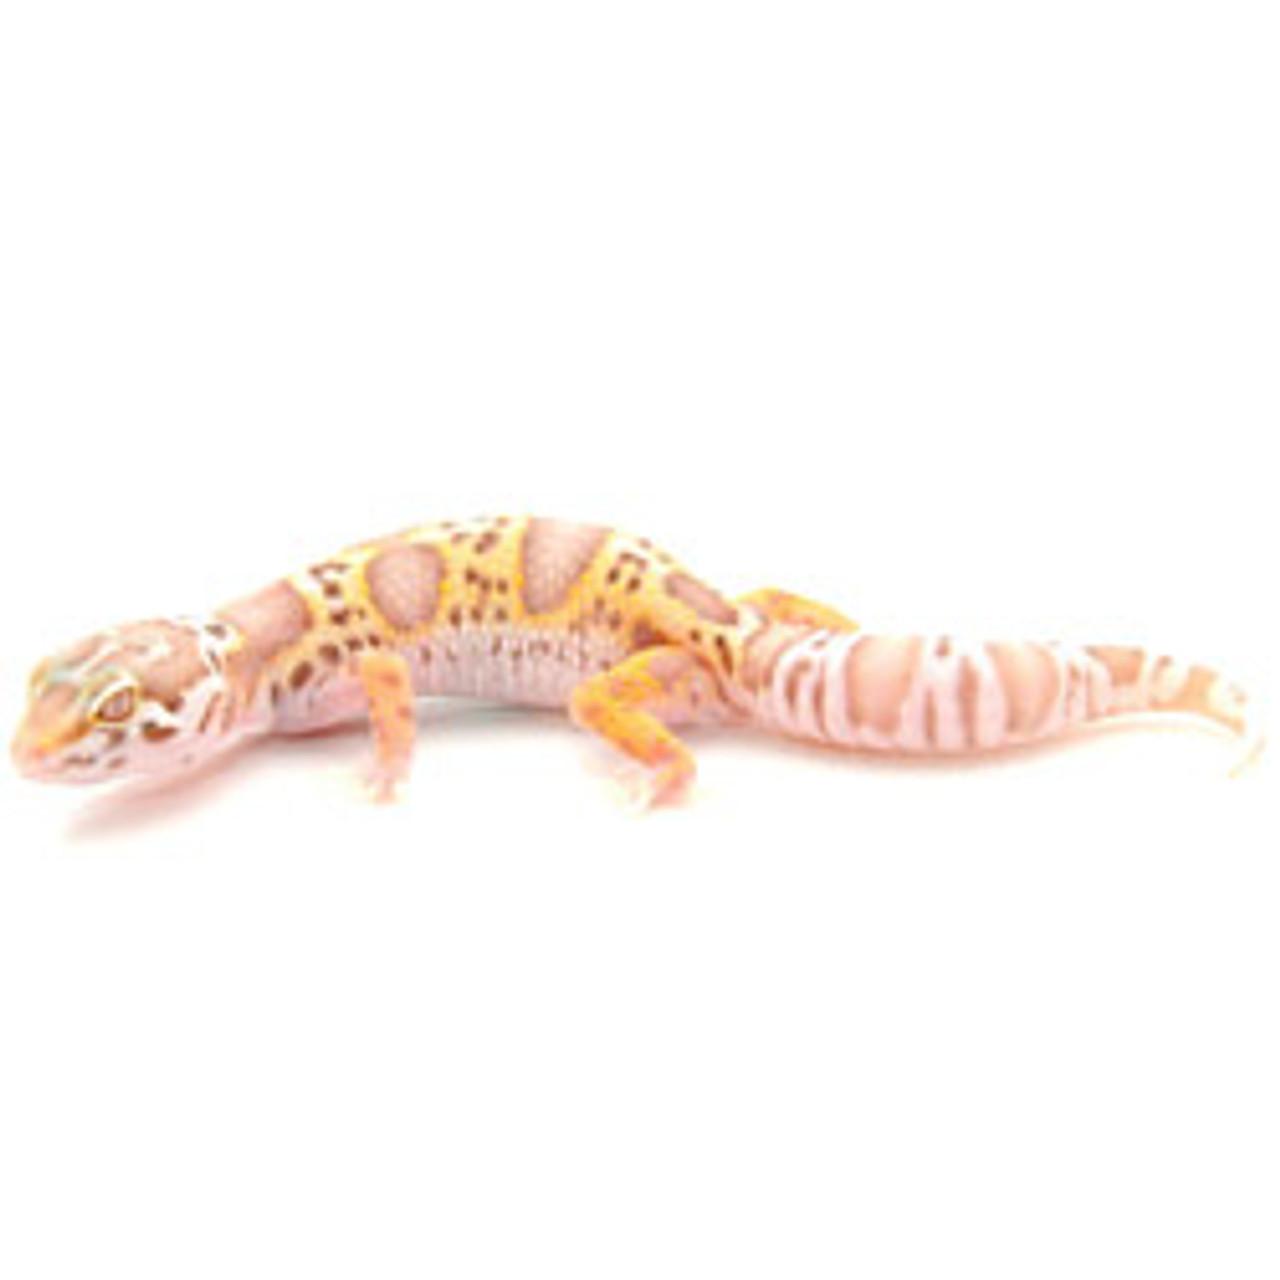 Mack Snow x Bell Albino Leopard Gecko (Eublepharis macularius) Juvenile